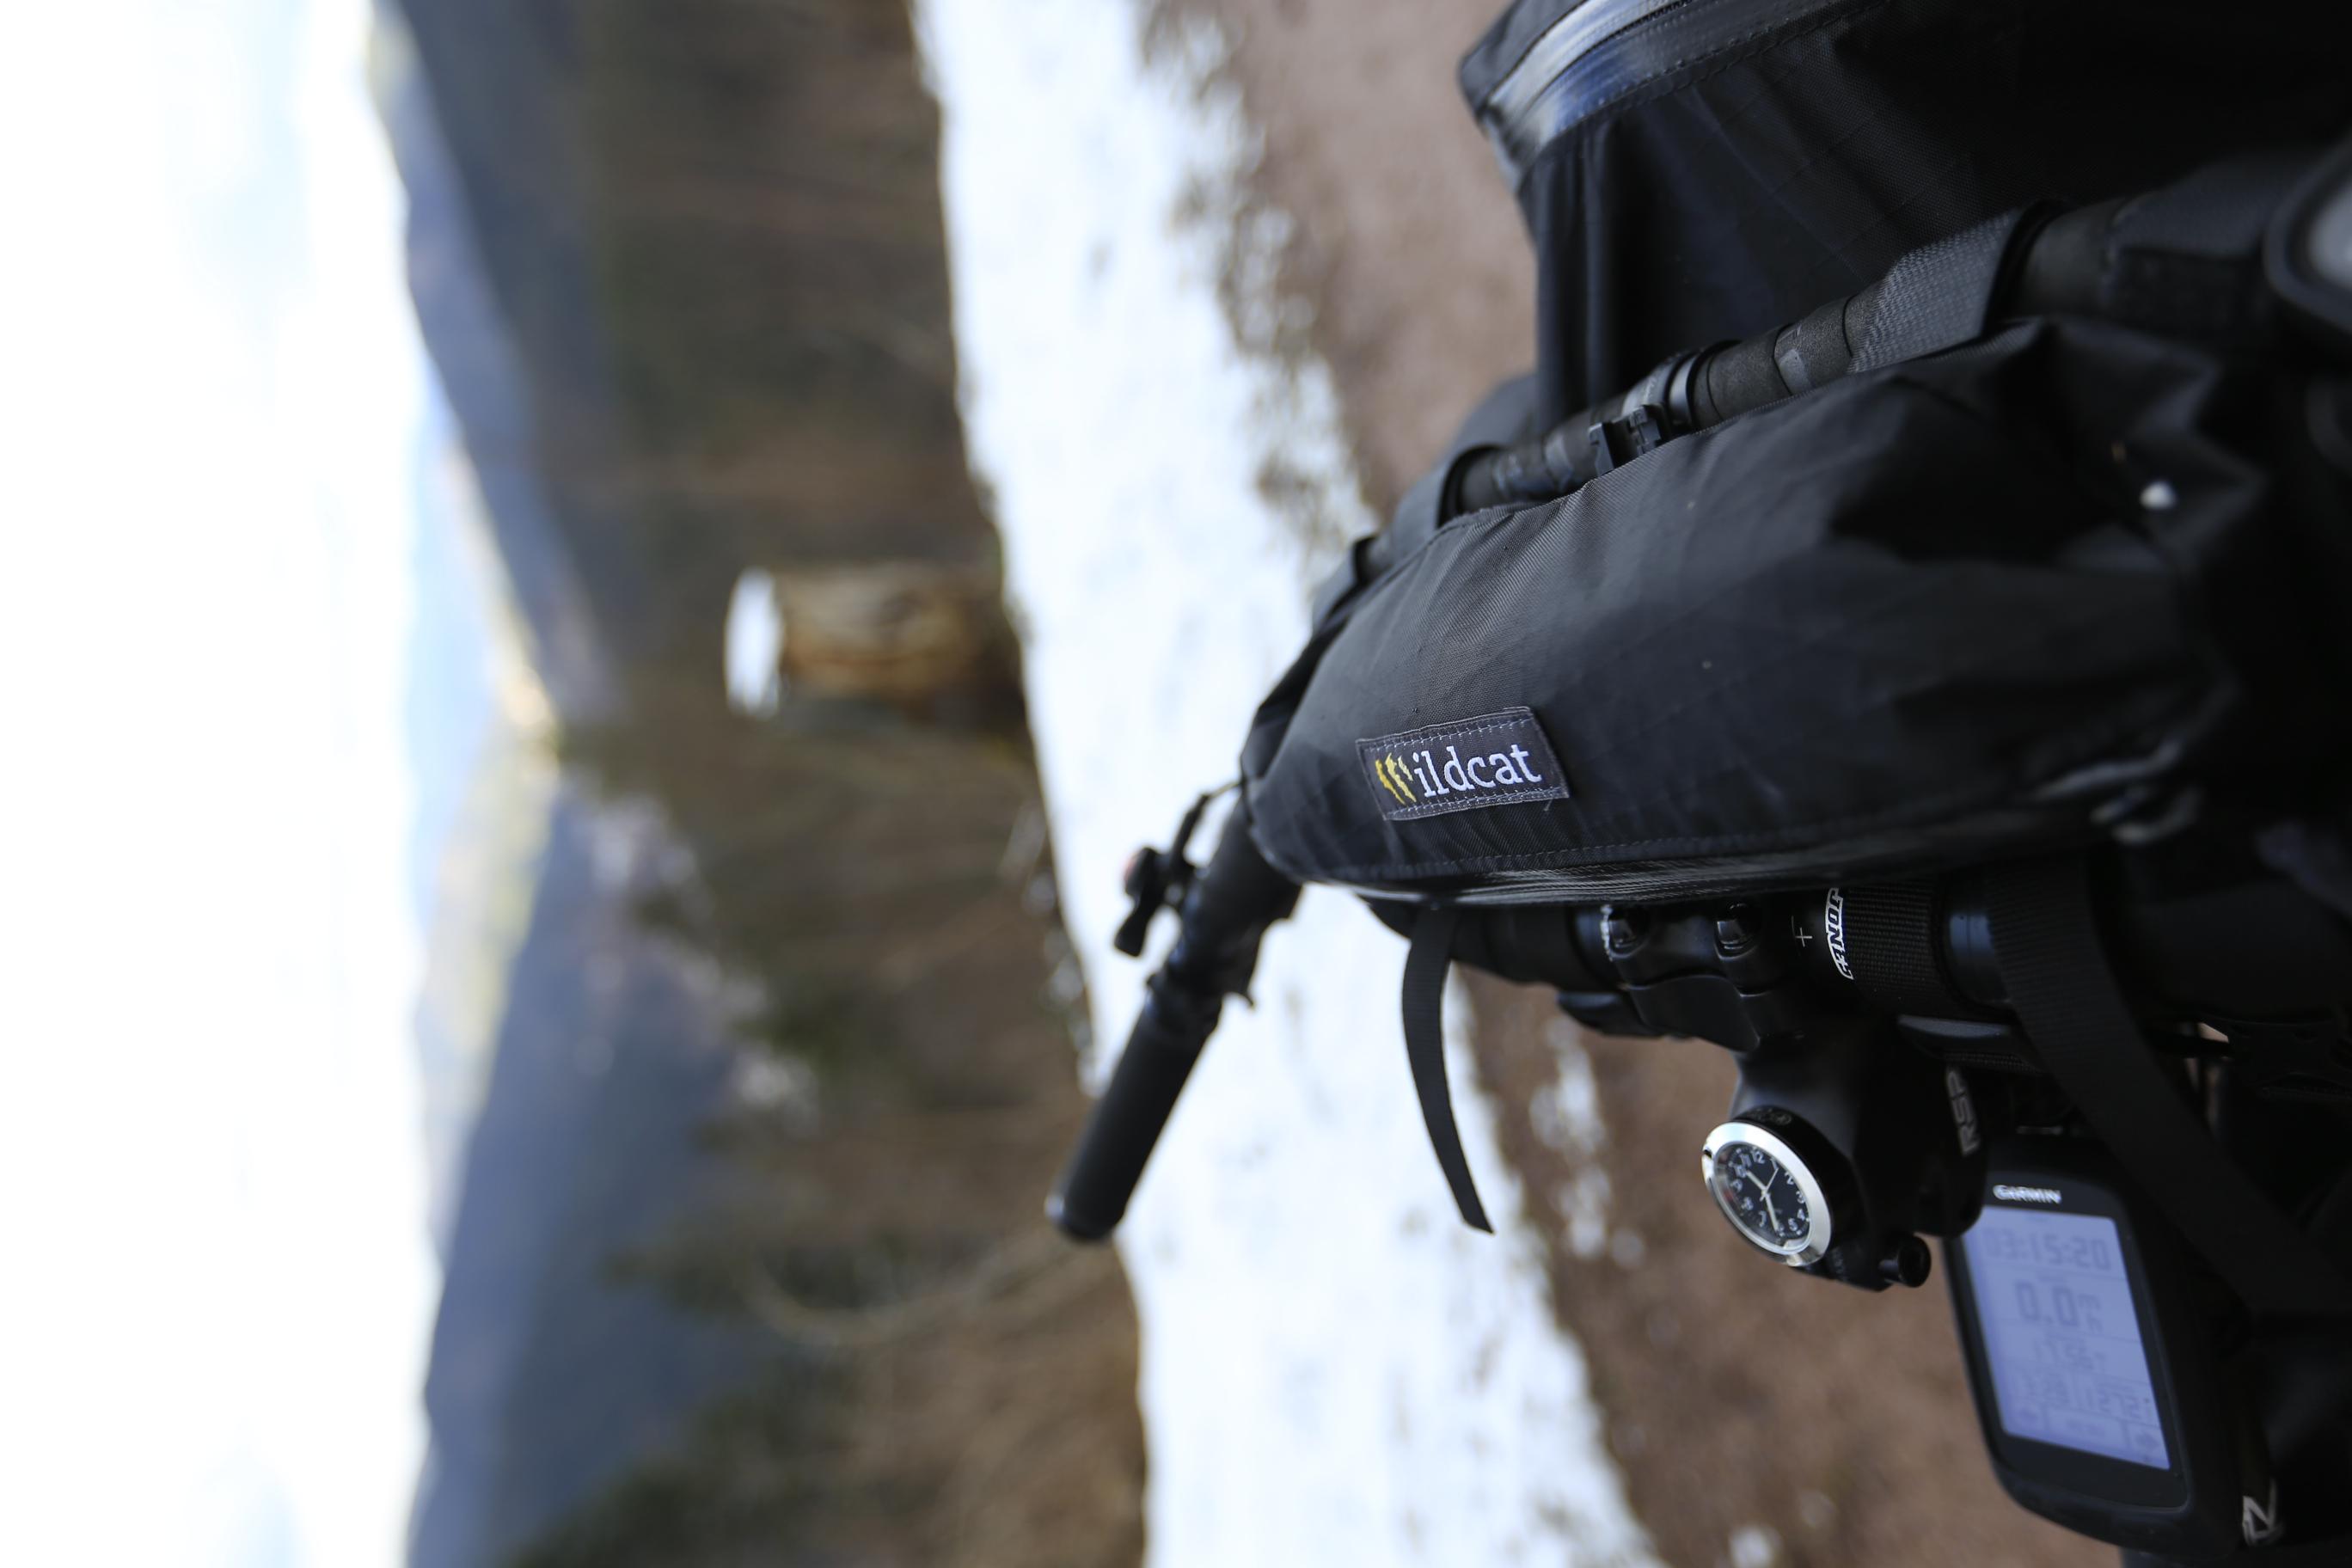 wildcat gear, bikepacking, uk bikepacking blog, cycling blog, tom cat, wildcat gear tom cat, photography, travel